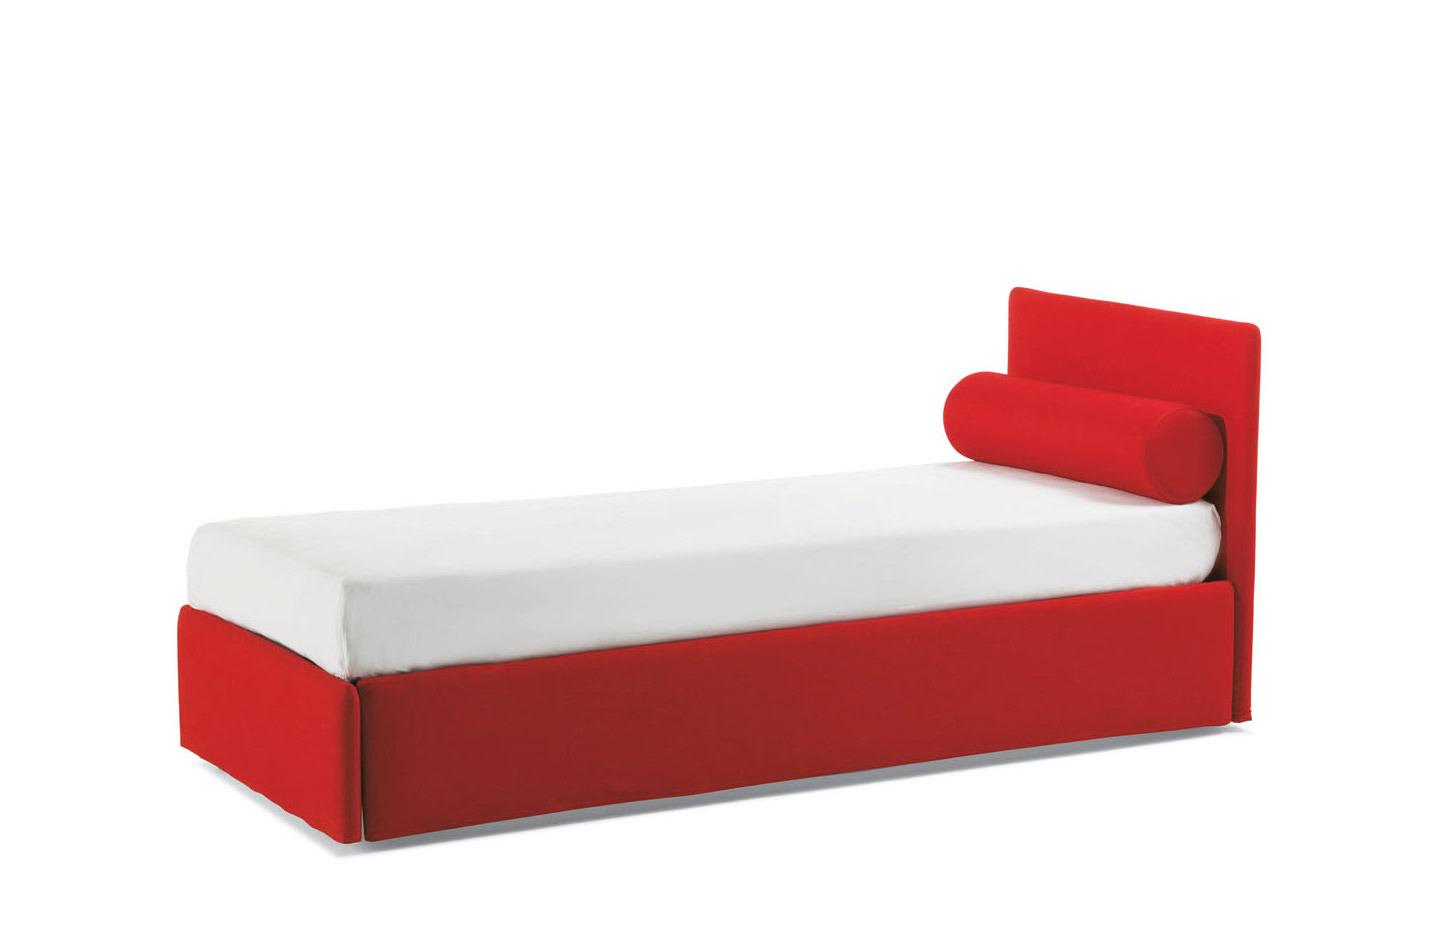 Bontempi Duplo Bett - Betten